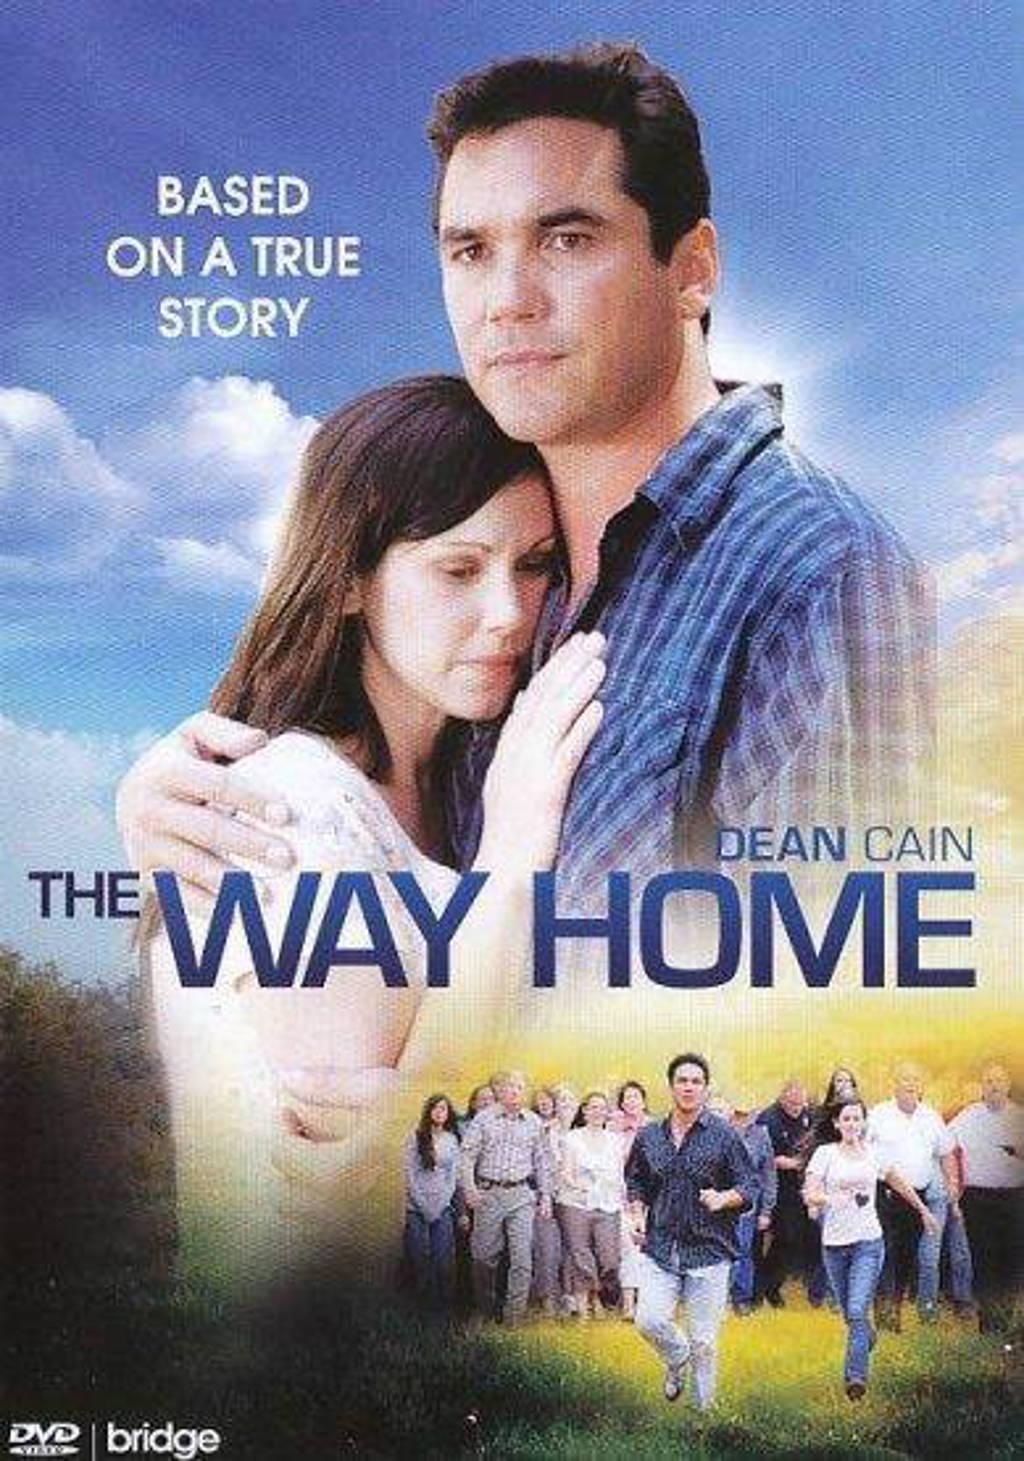 Way home (DVD)